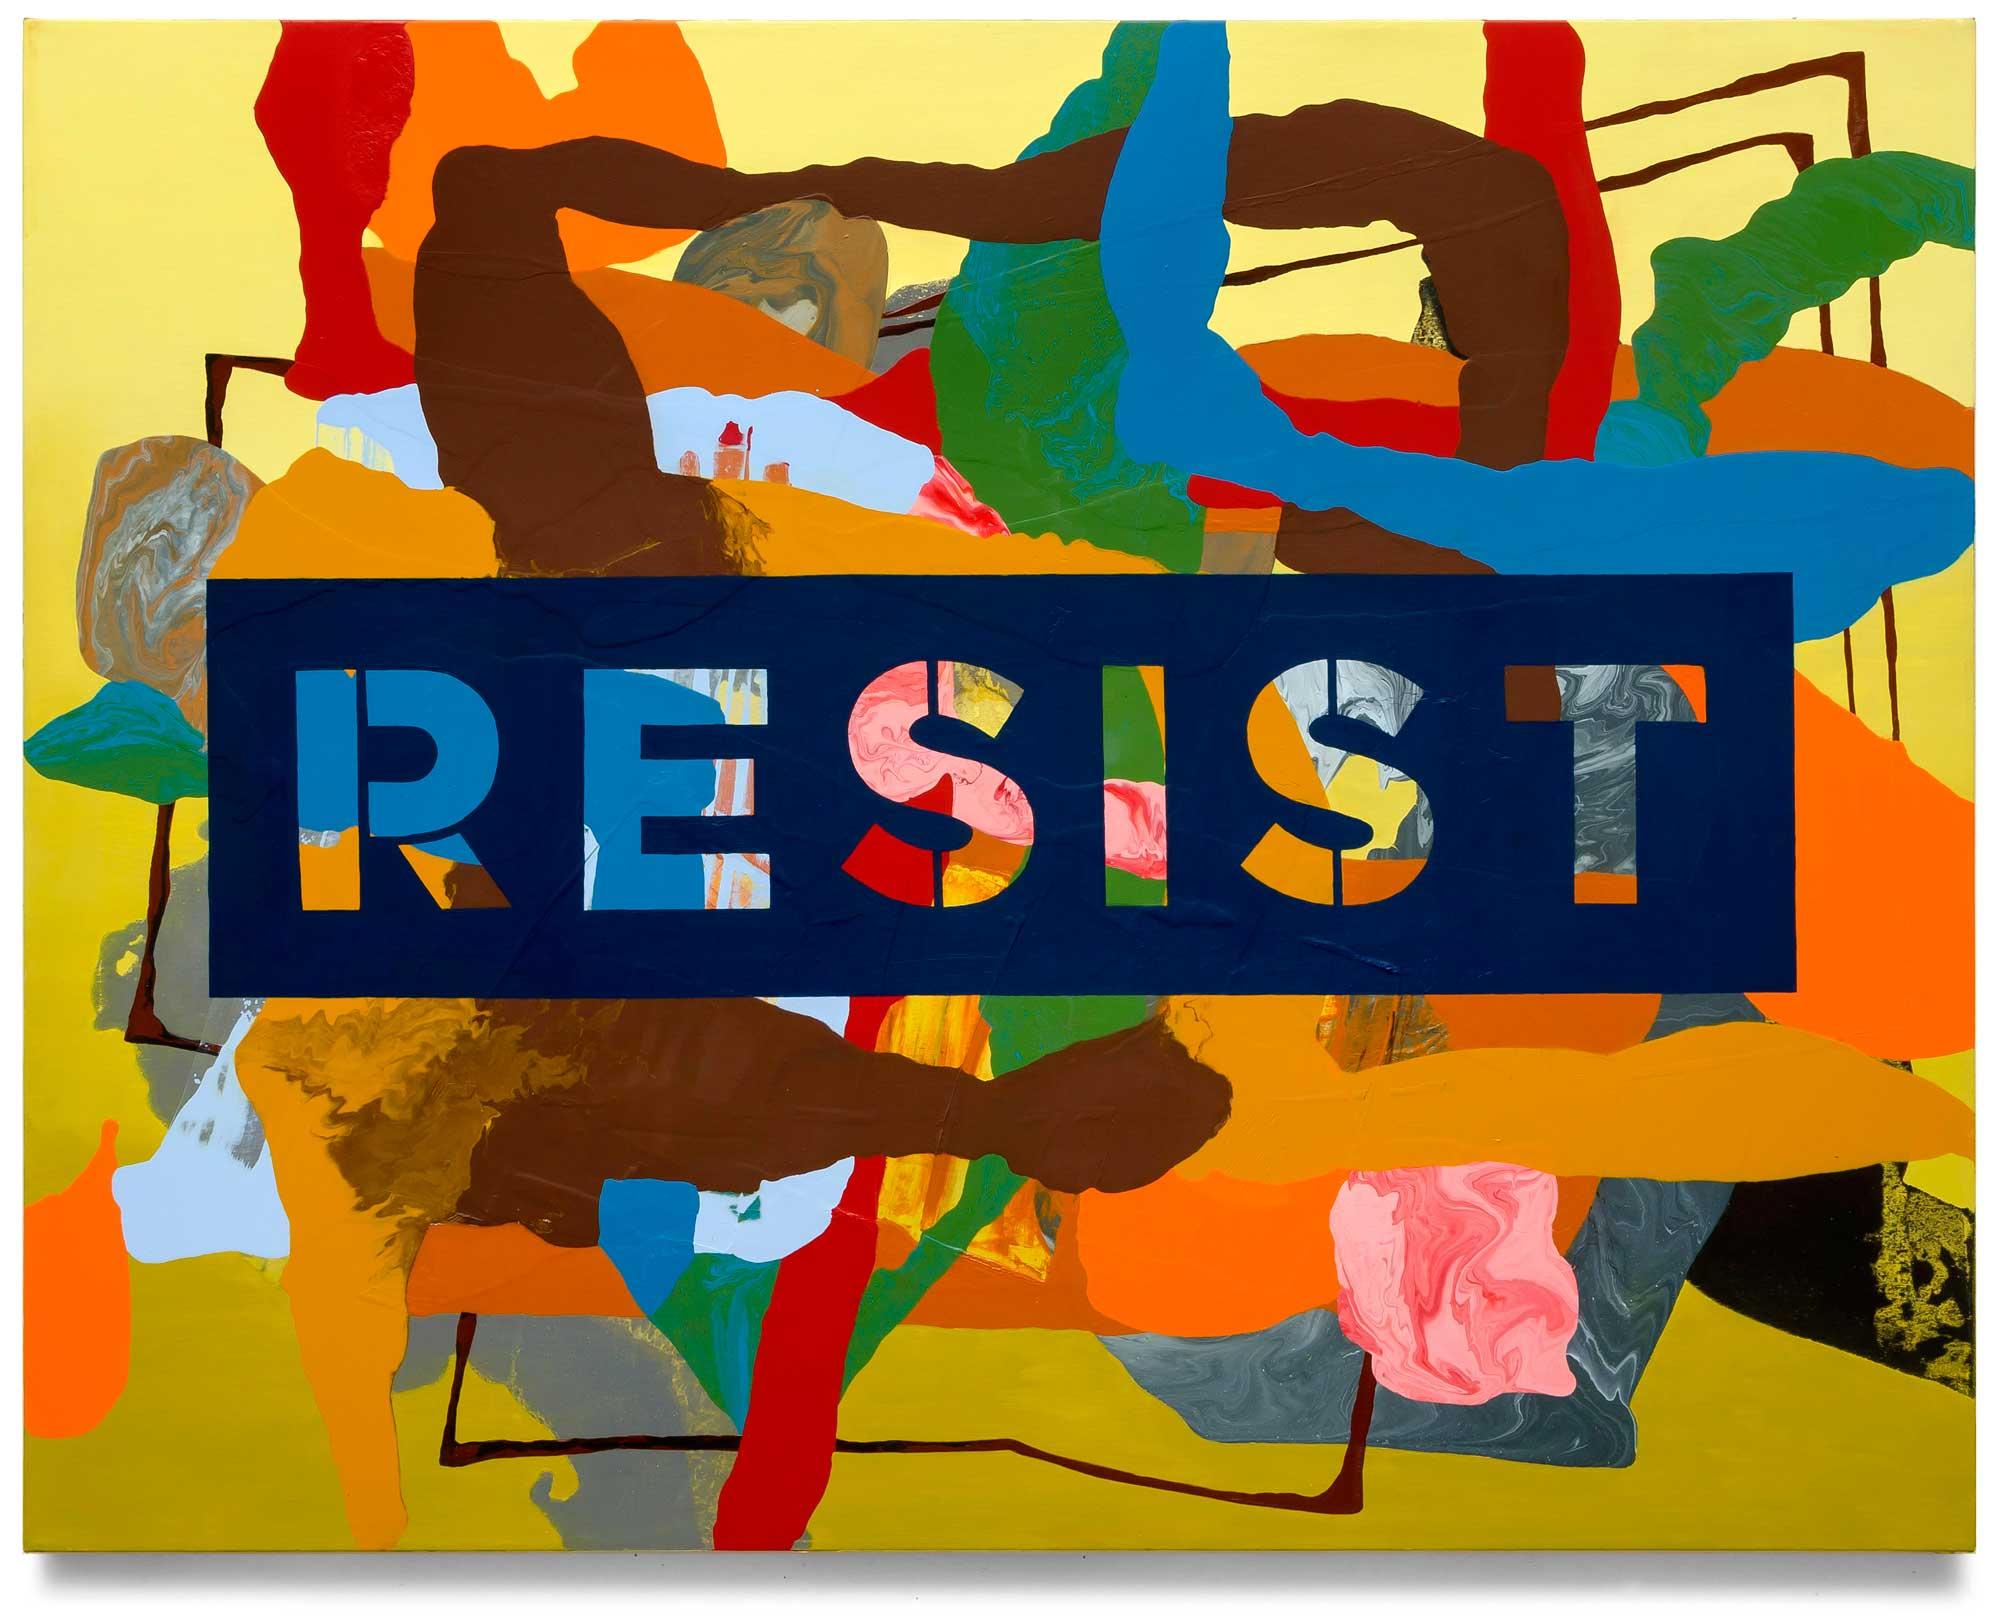 Resist-oil-on-canvas-111.76 cm x 142.24 cm.